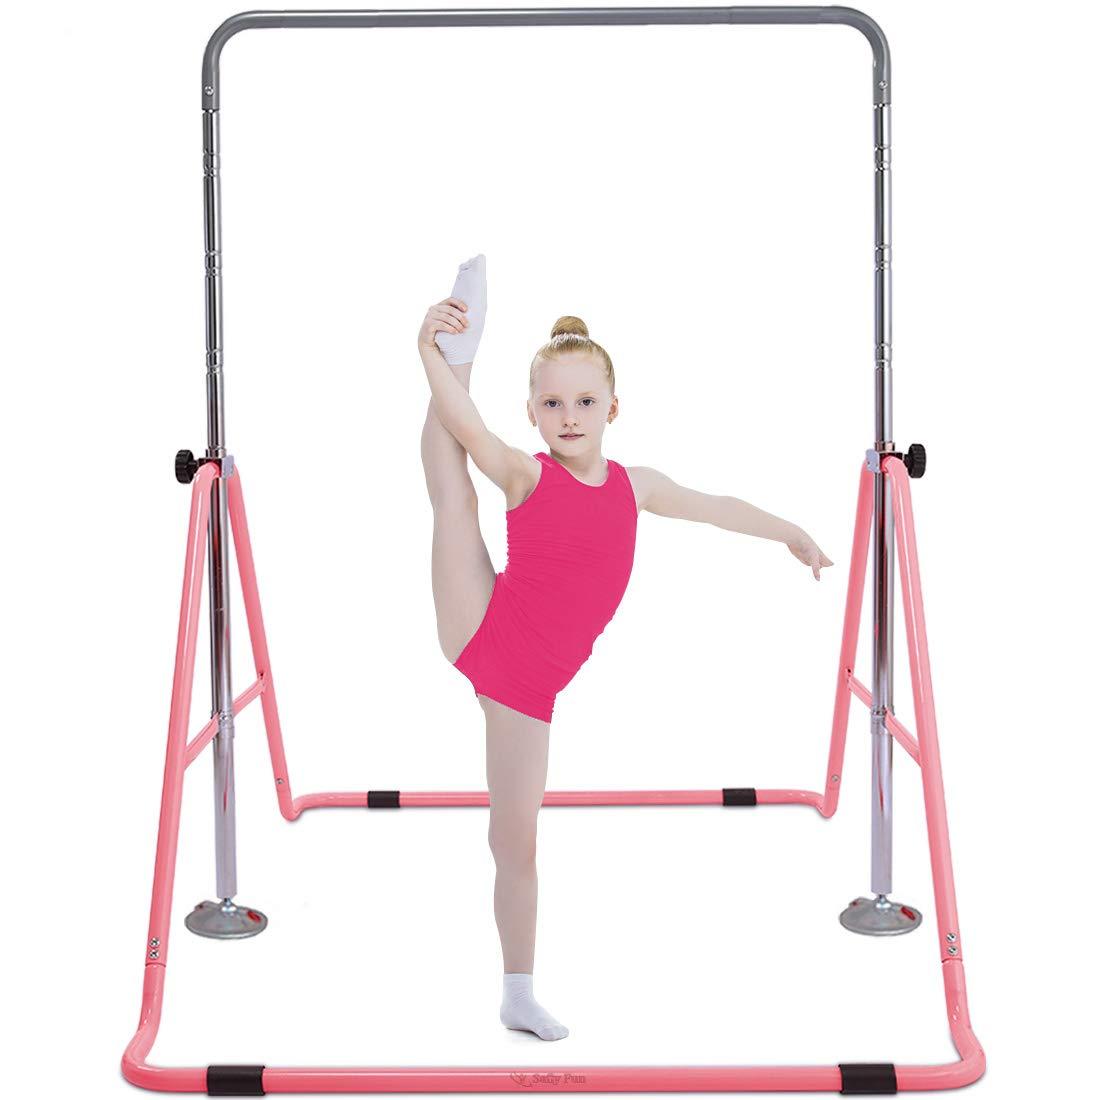 Safly Fun Gymnastics Junior Kip Bar For Sale